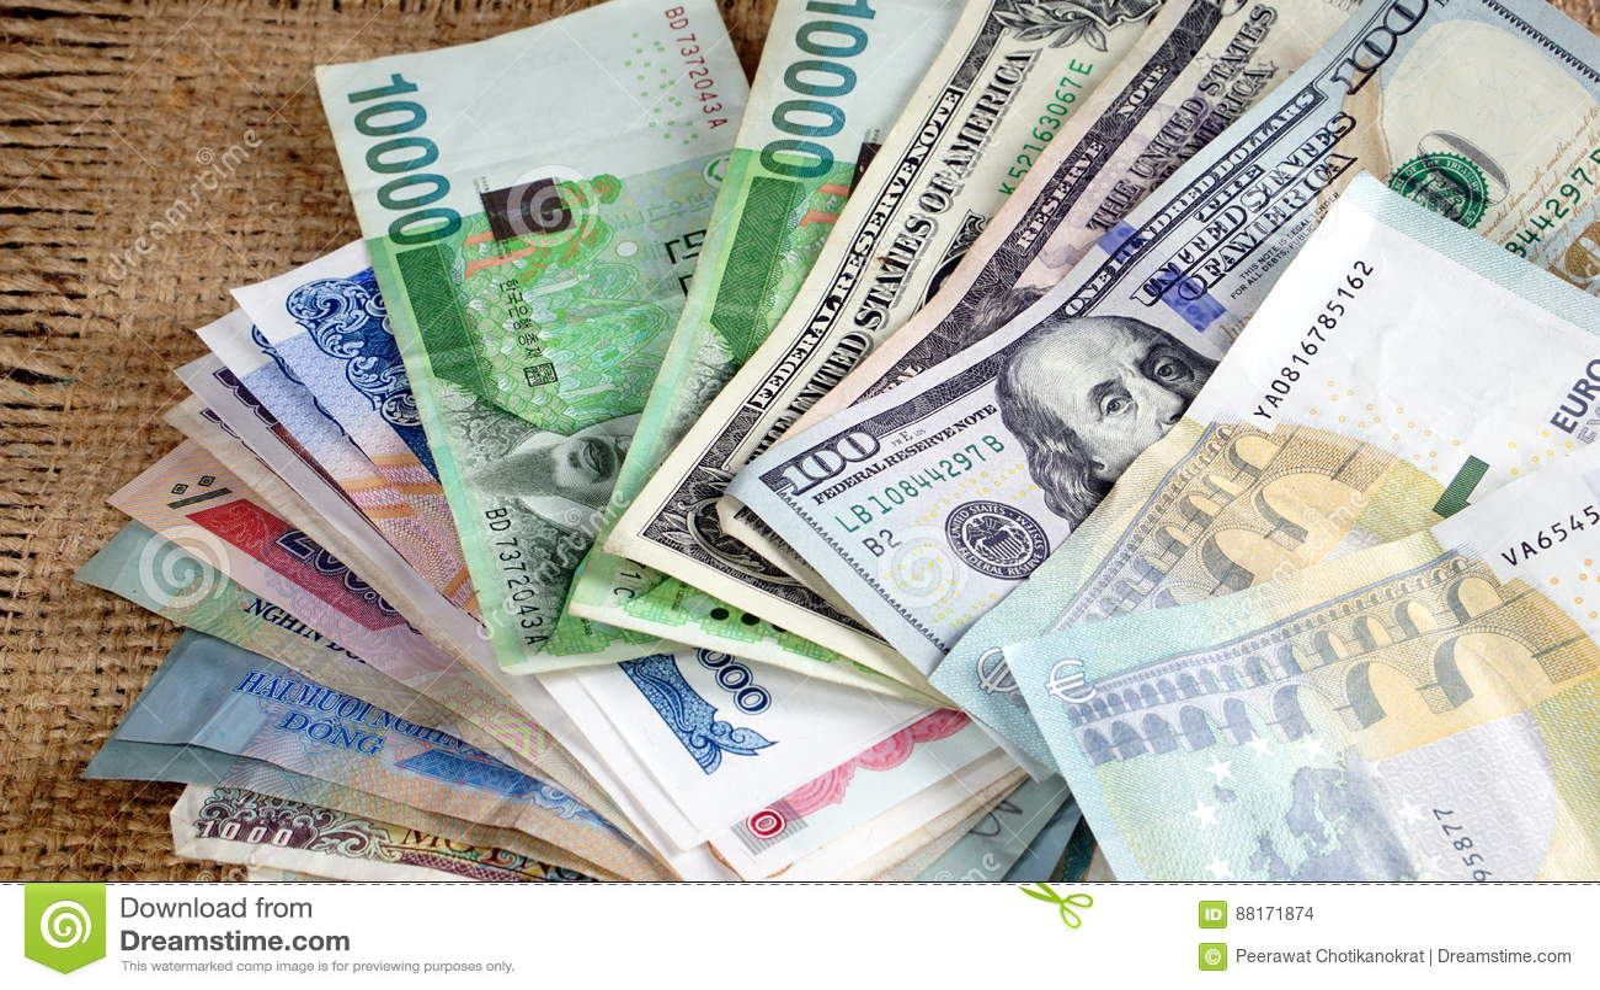 US Dollars, Korean Won, Euro Bills And Some Money Bills And Banknotes. Stock Photo - Image of ...